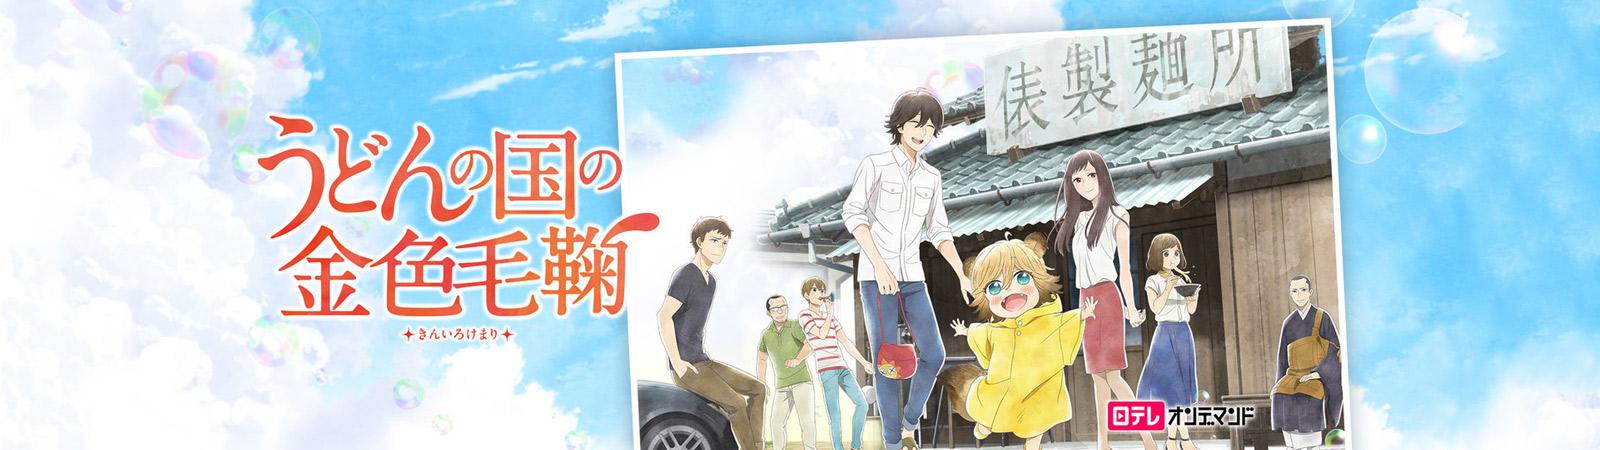 Tập 4 - Udon No Kuni No Kiniro Kemari